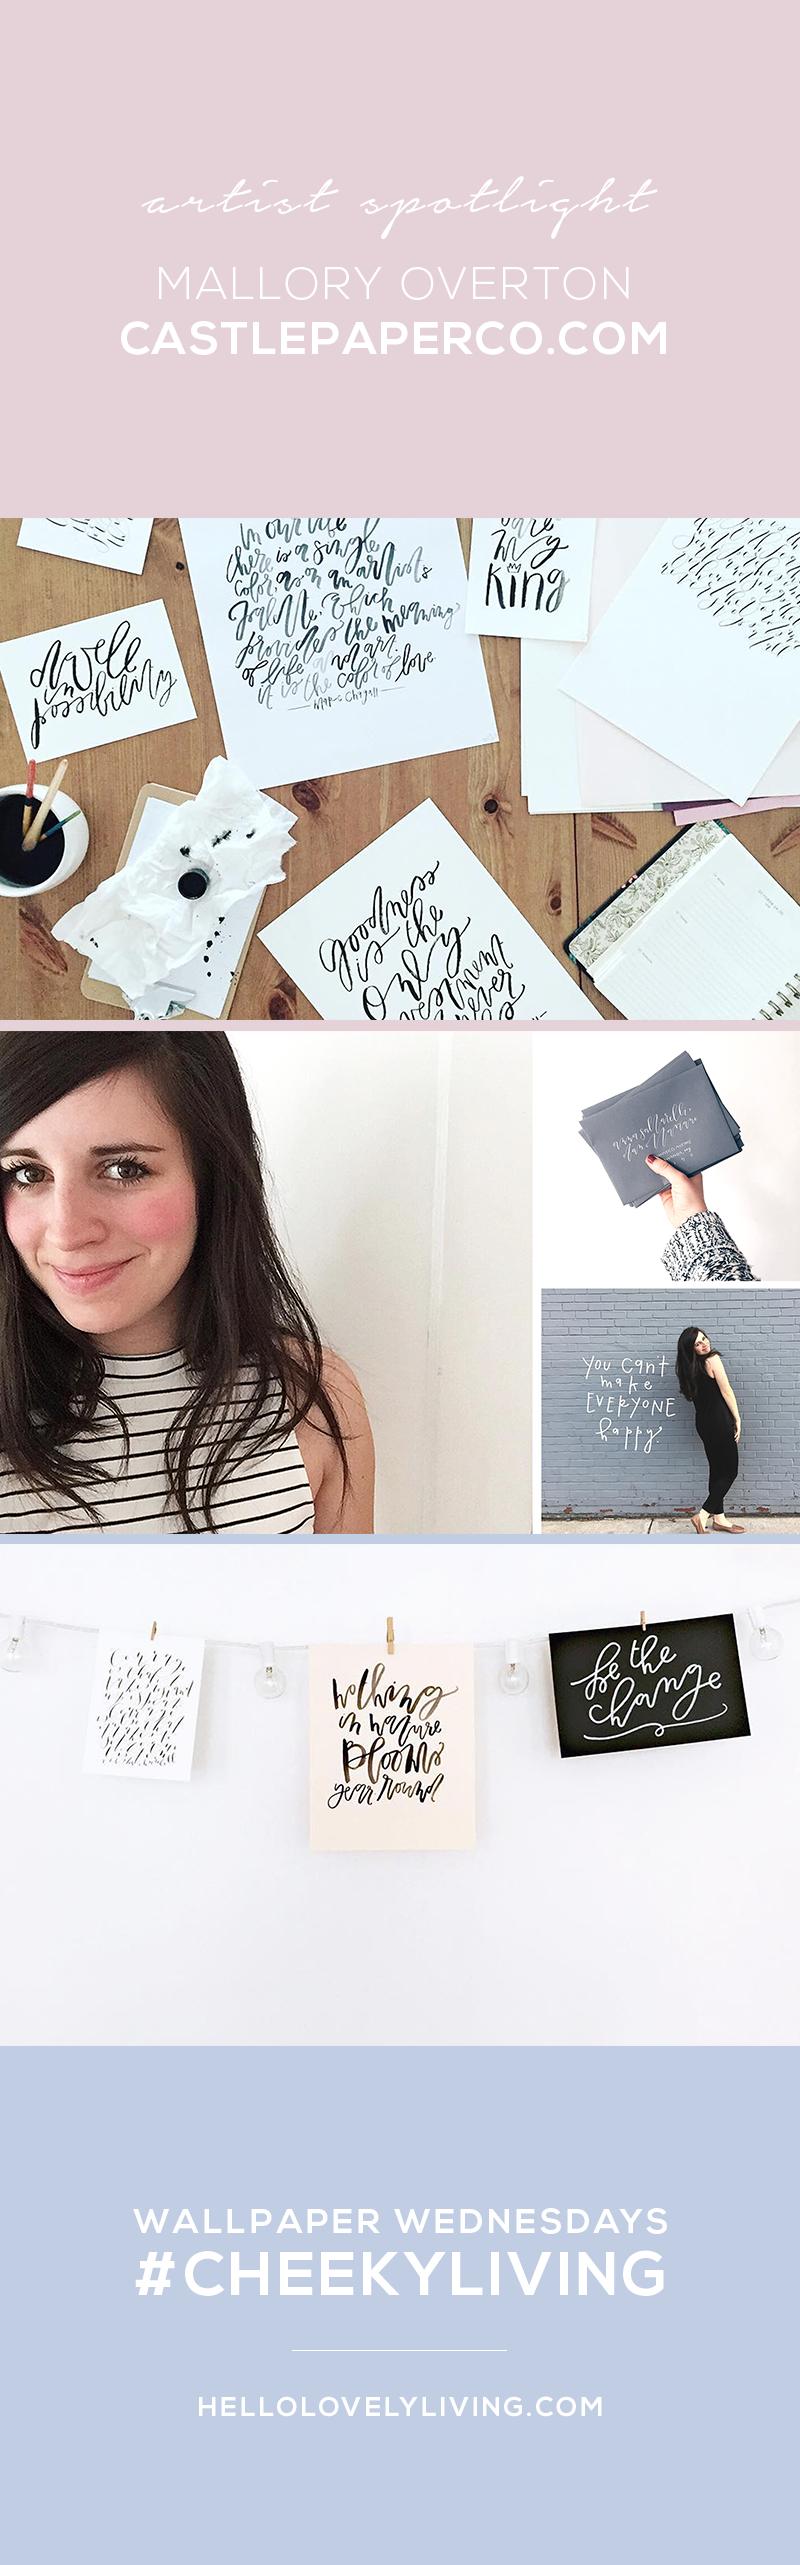 Wallpapers Wednesdays 31 | Artist Feature - Mallory Overton